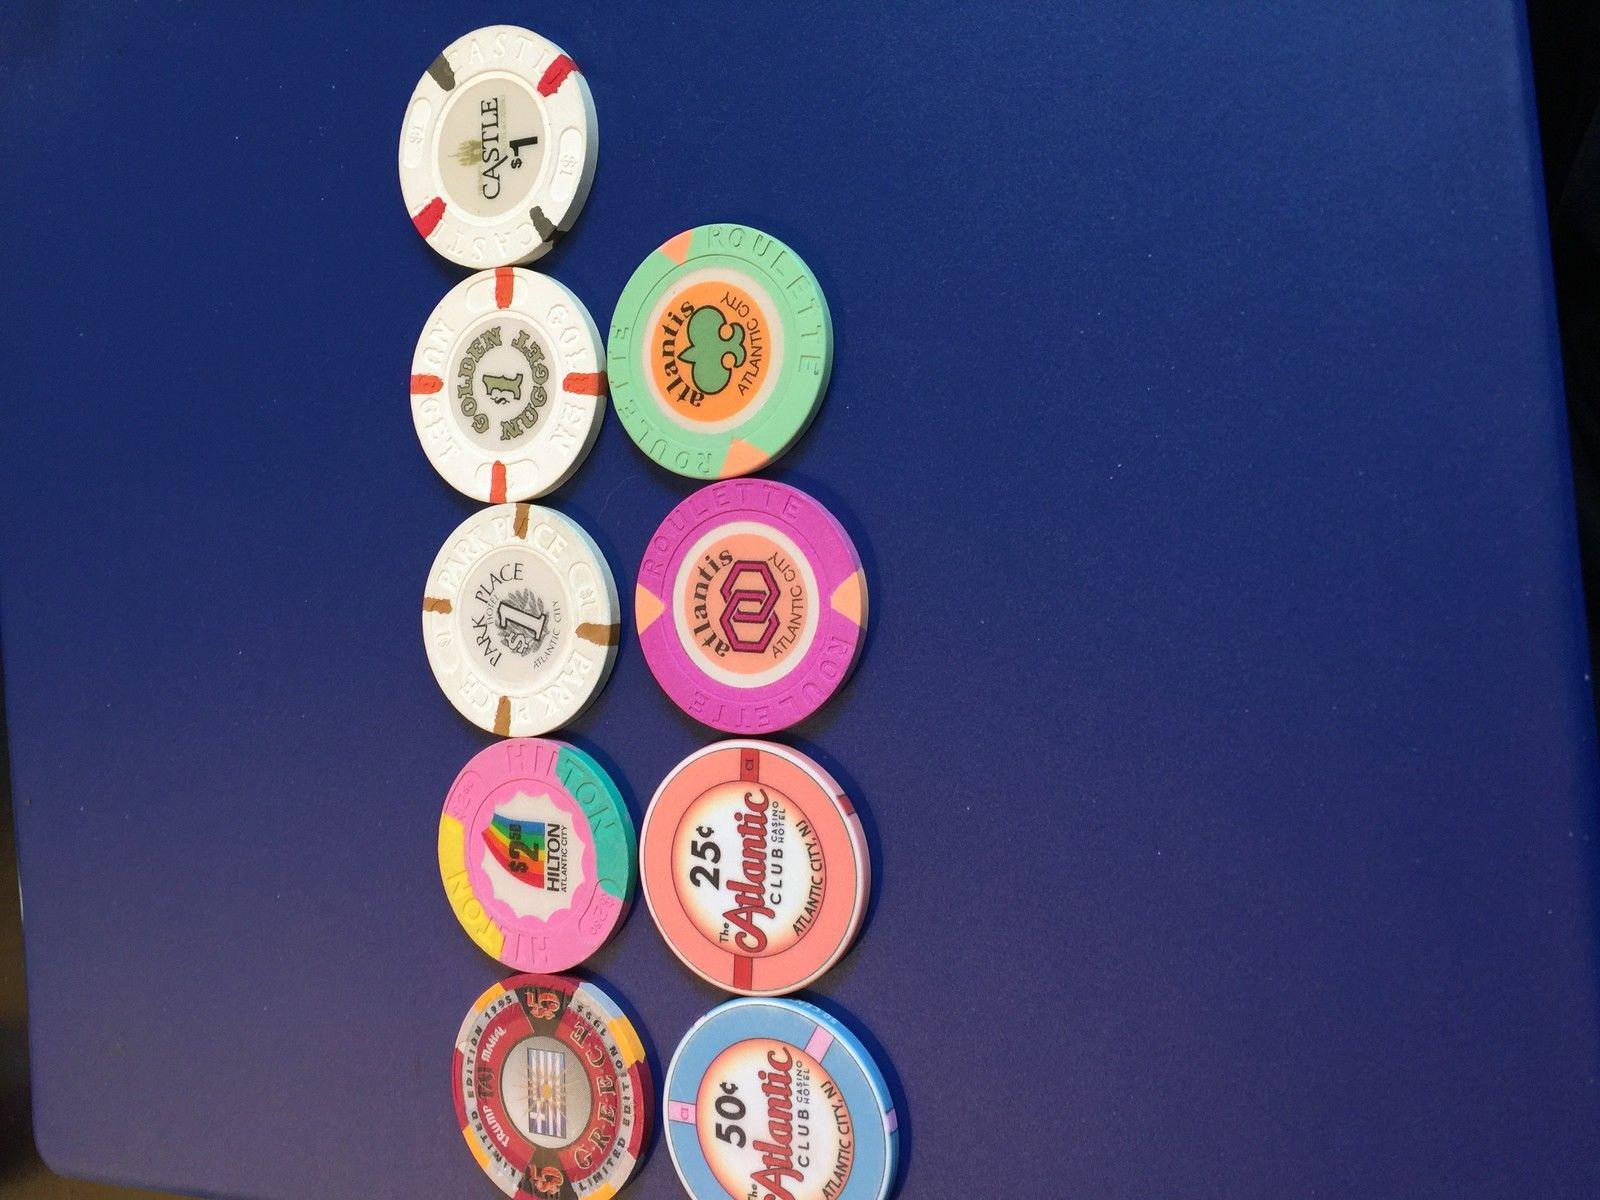 online slots casino online kasino